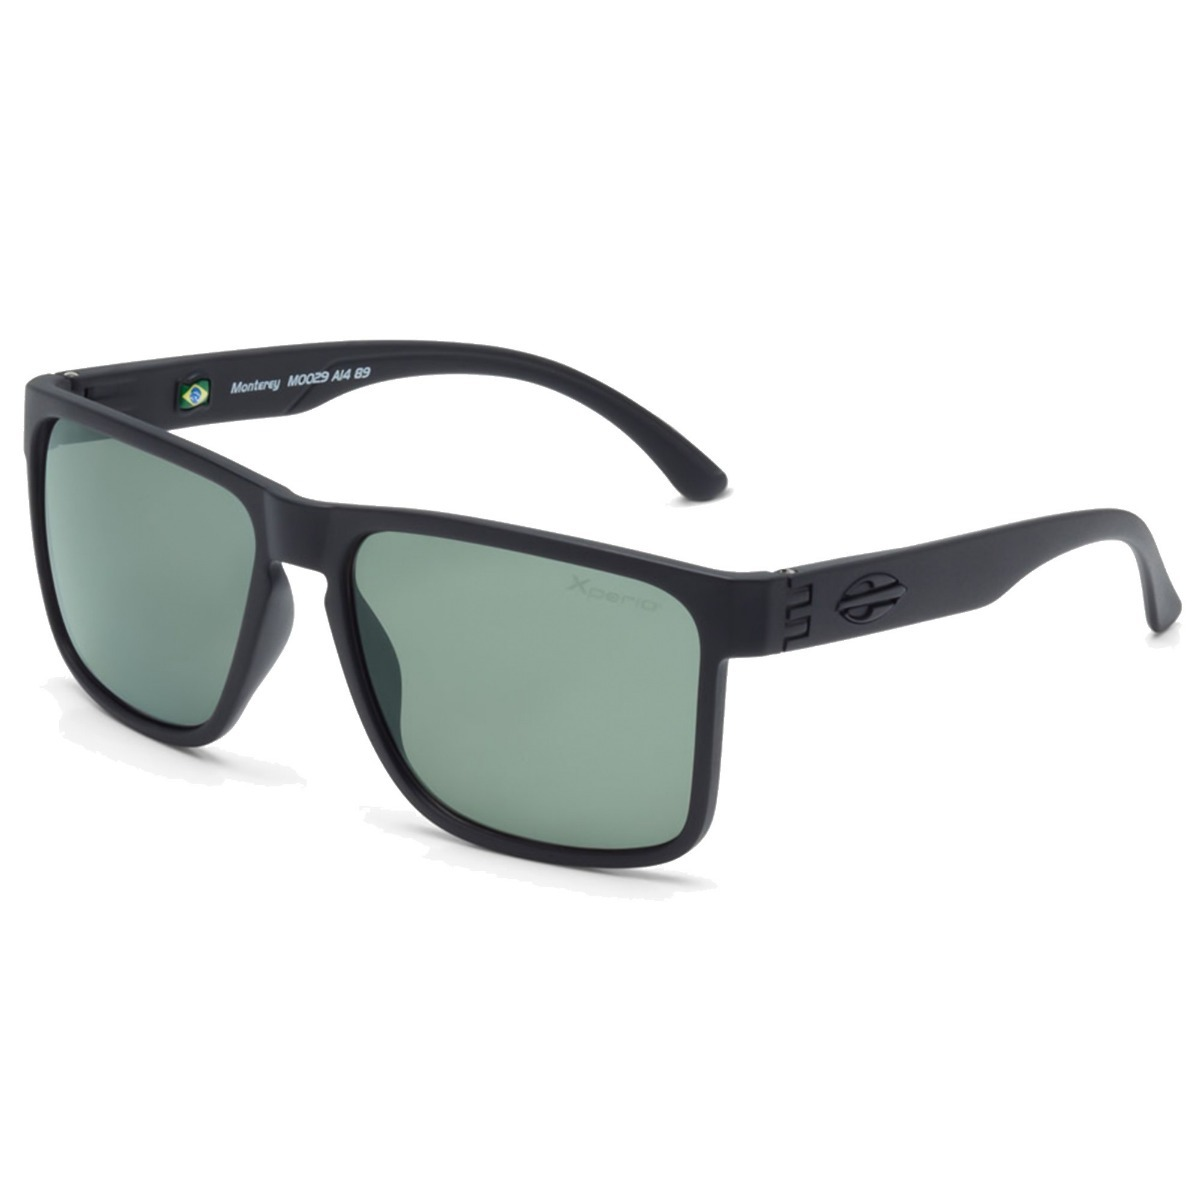 bb6889914940f Óculos De Sol Mormaii Monterey Moo29 A14 89 - R  239,00 em Mercado Livre